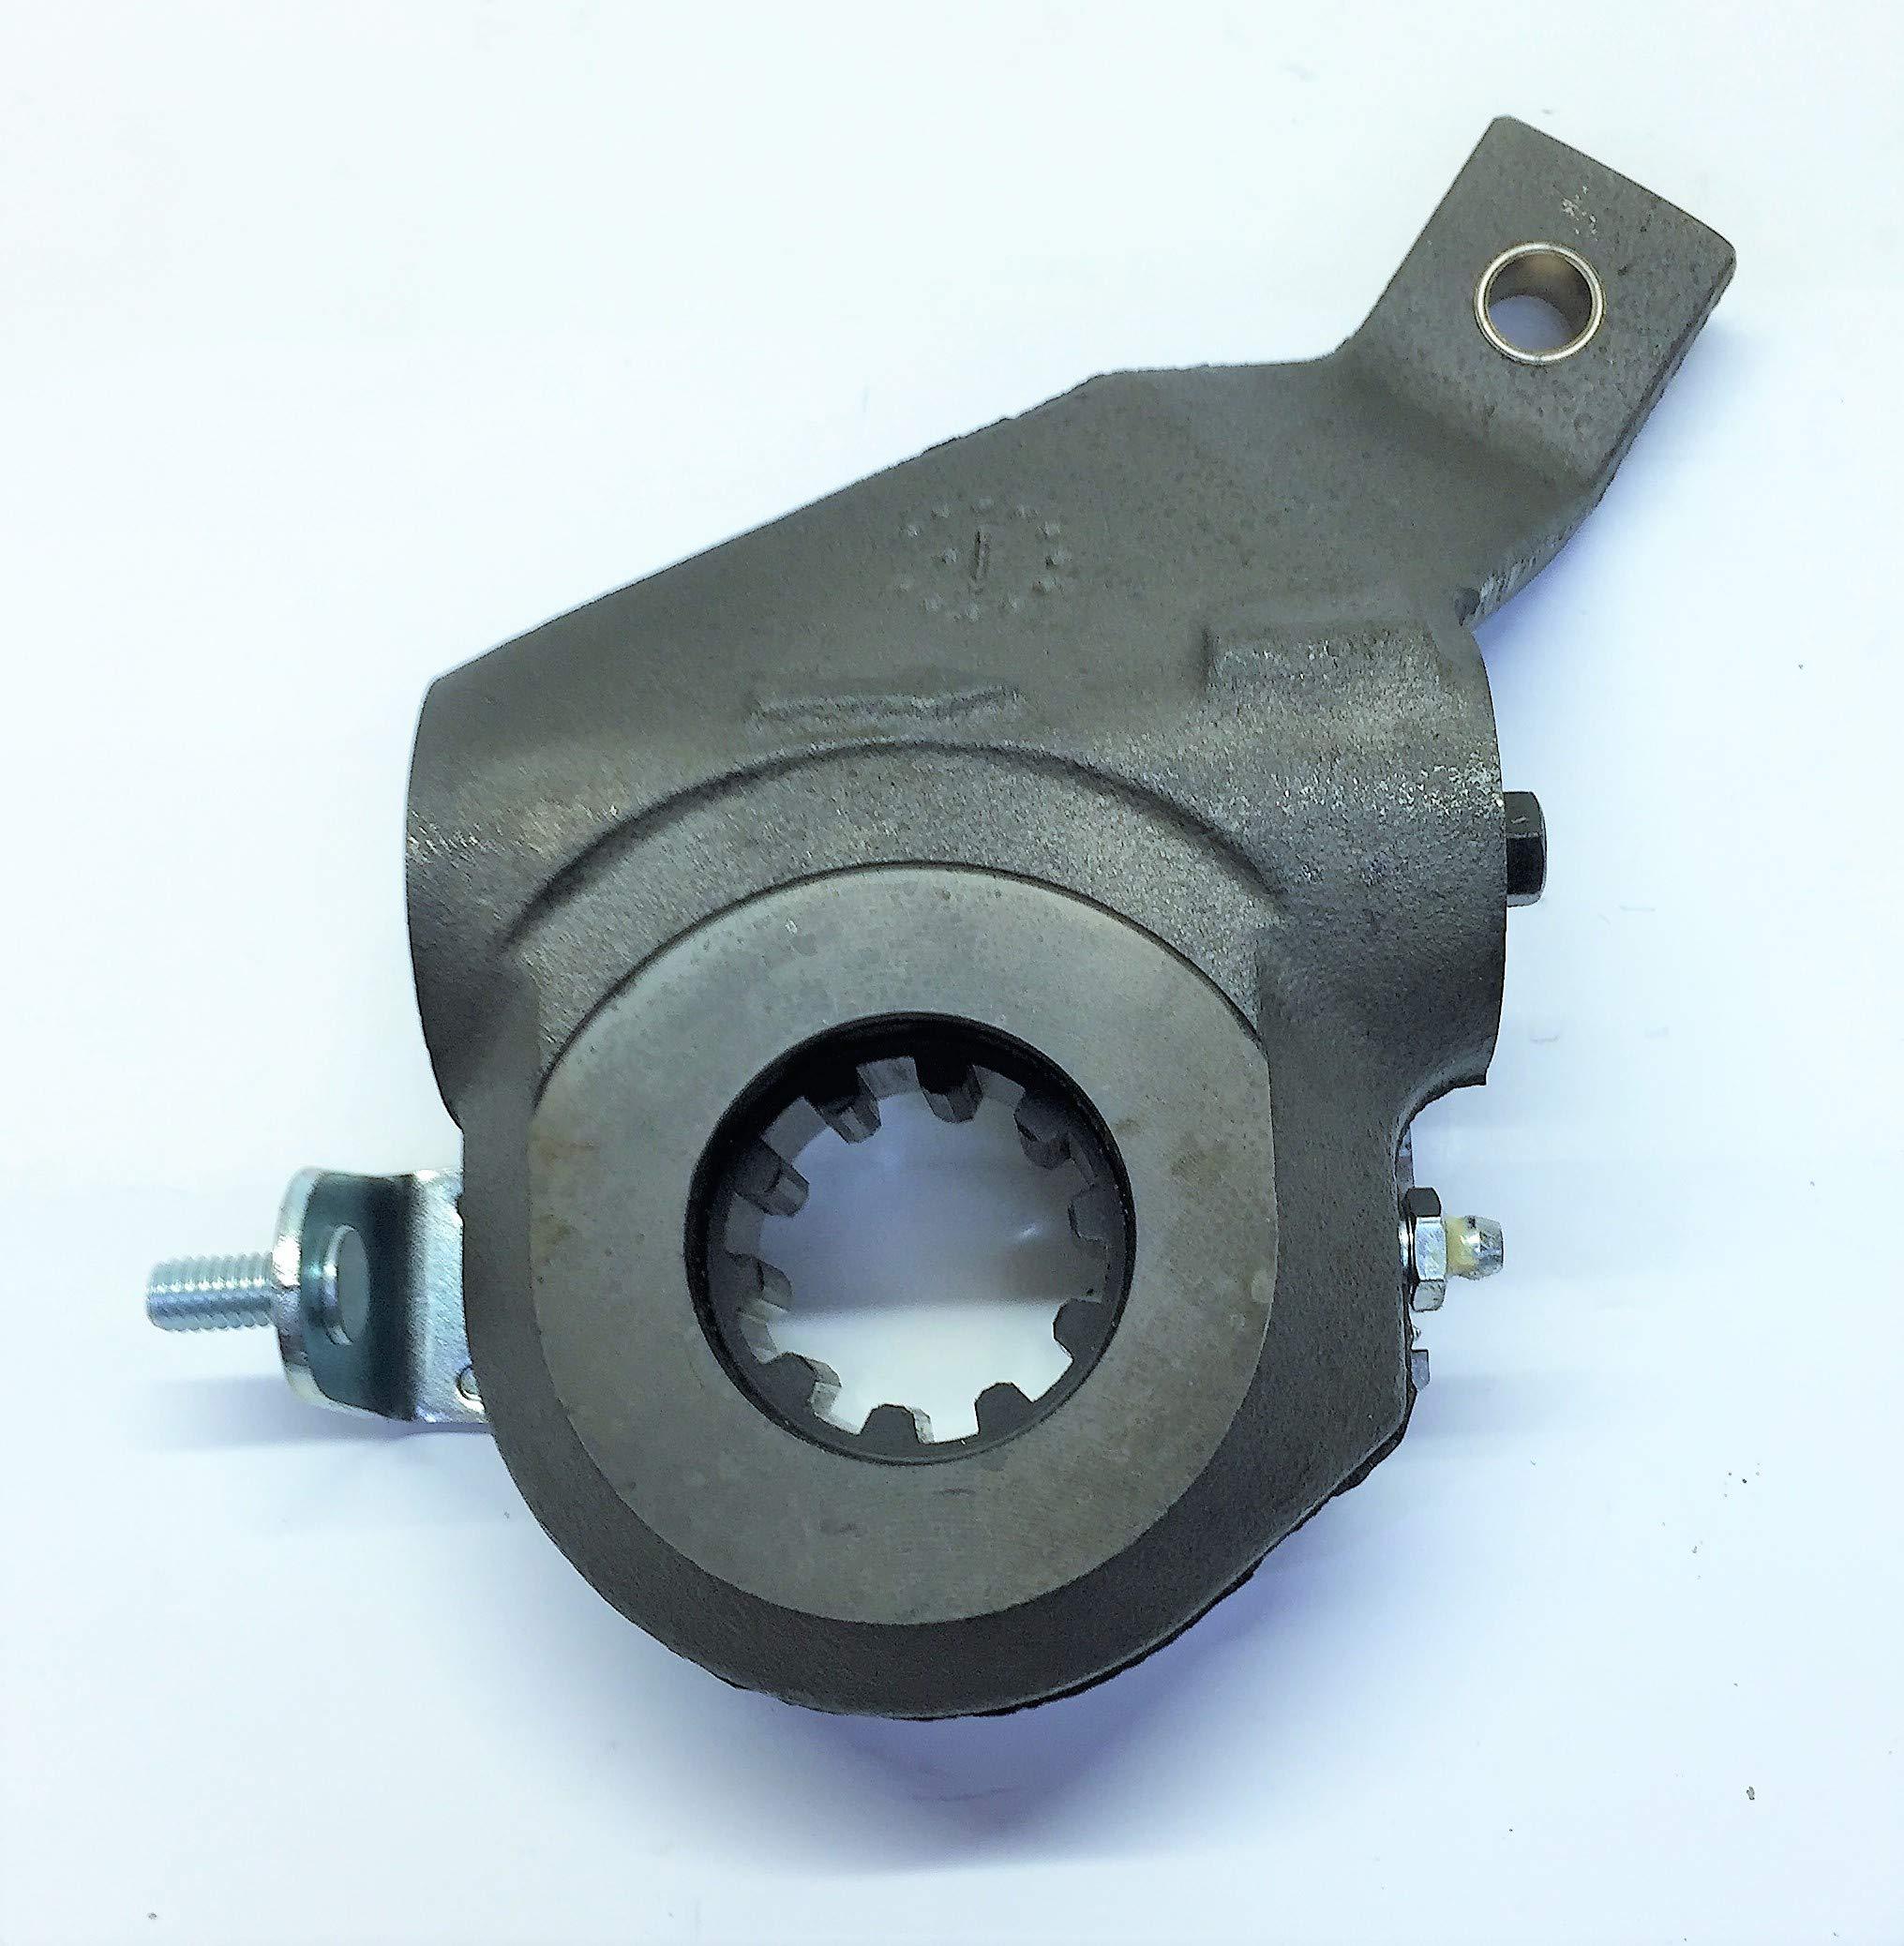 Haldex Automatic Brake Adjuster 409-10590 by Haldex (Image #4)